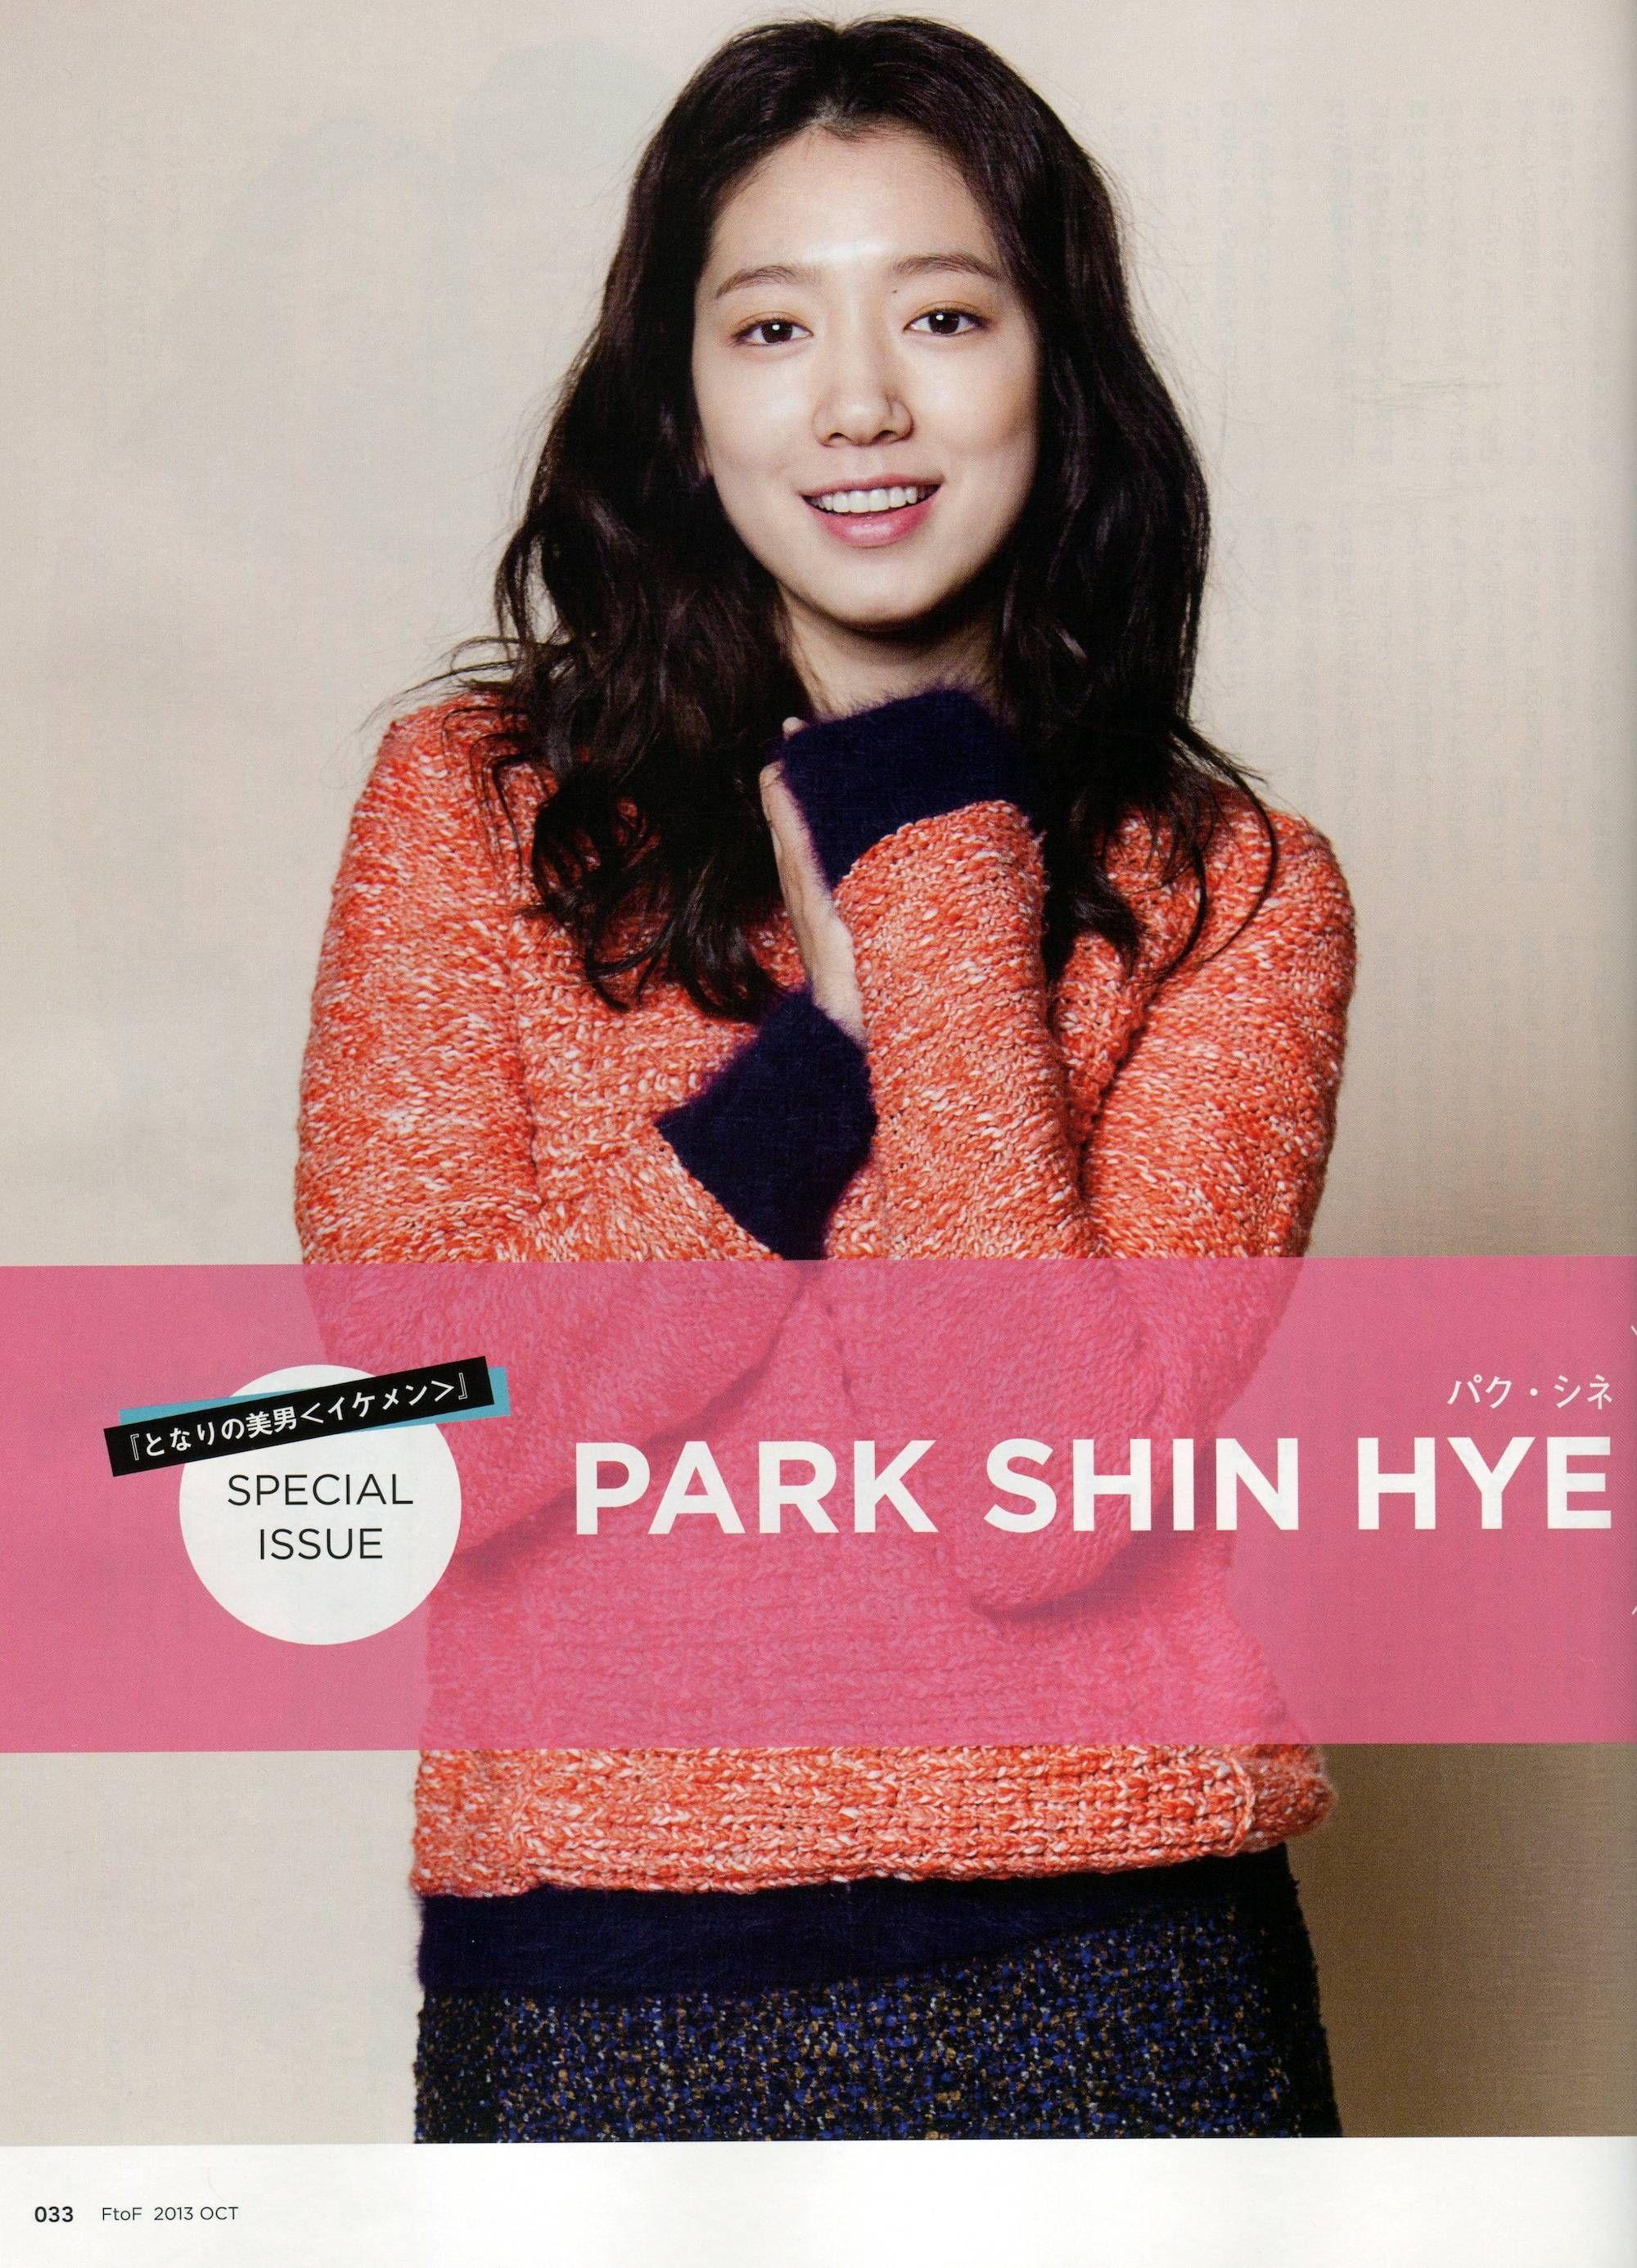 K-GIRLS :: 박신혜(Park Shin Hye) 사진모음